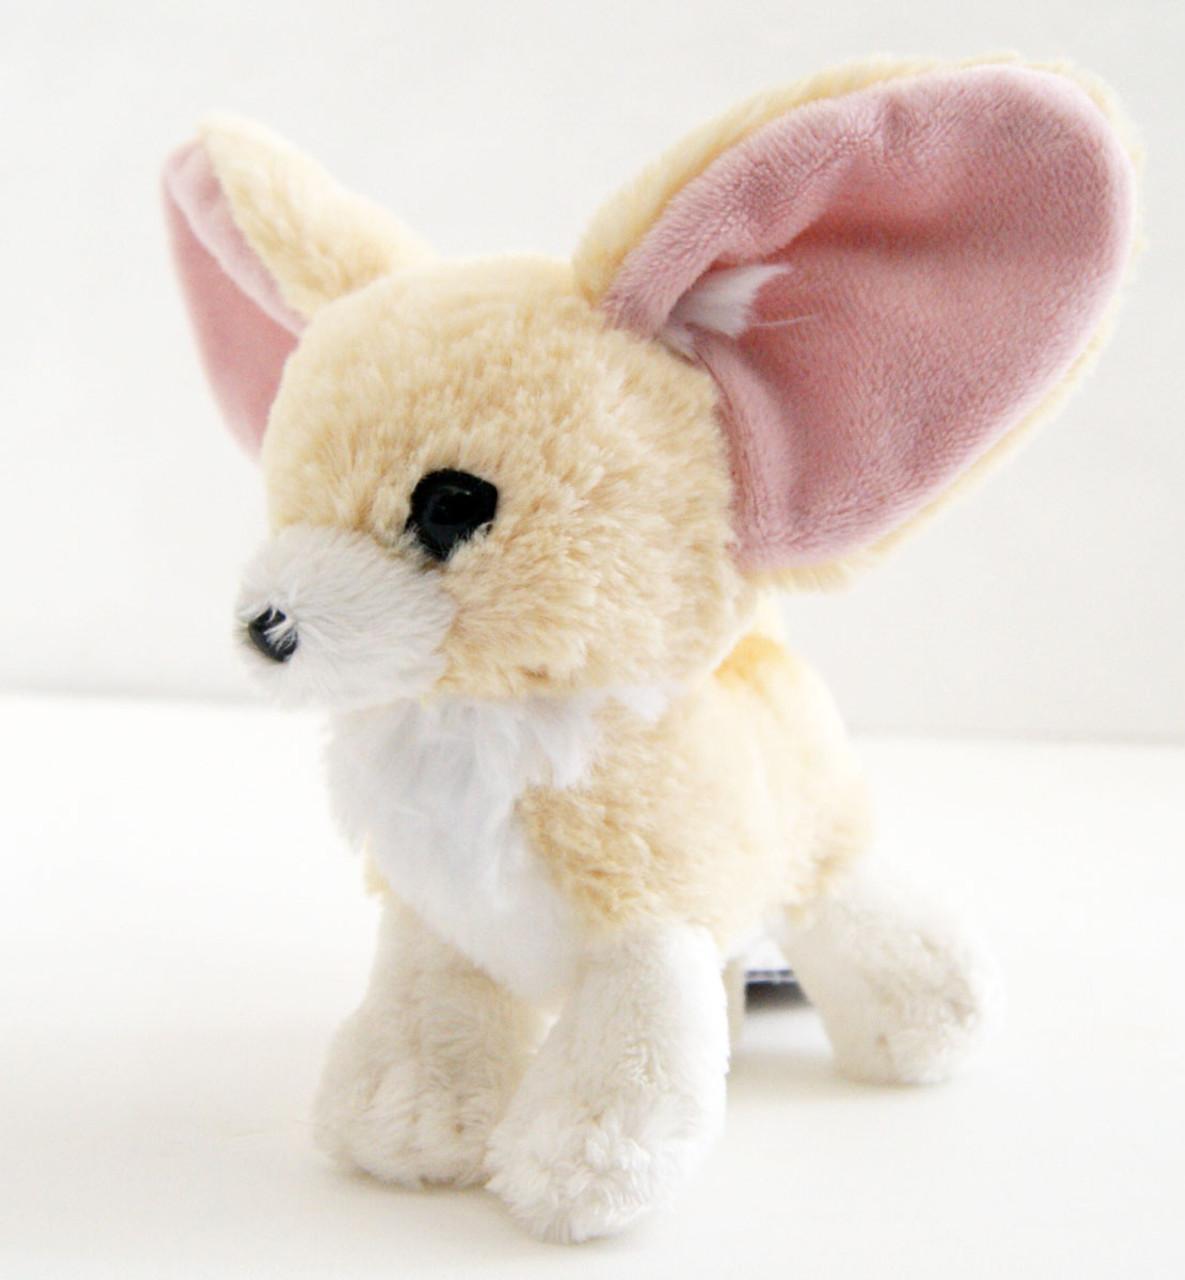 Fluffies Plush Doll Stuffed toy S ferret SUN LEMON 30cm JAPAN 2020